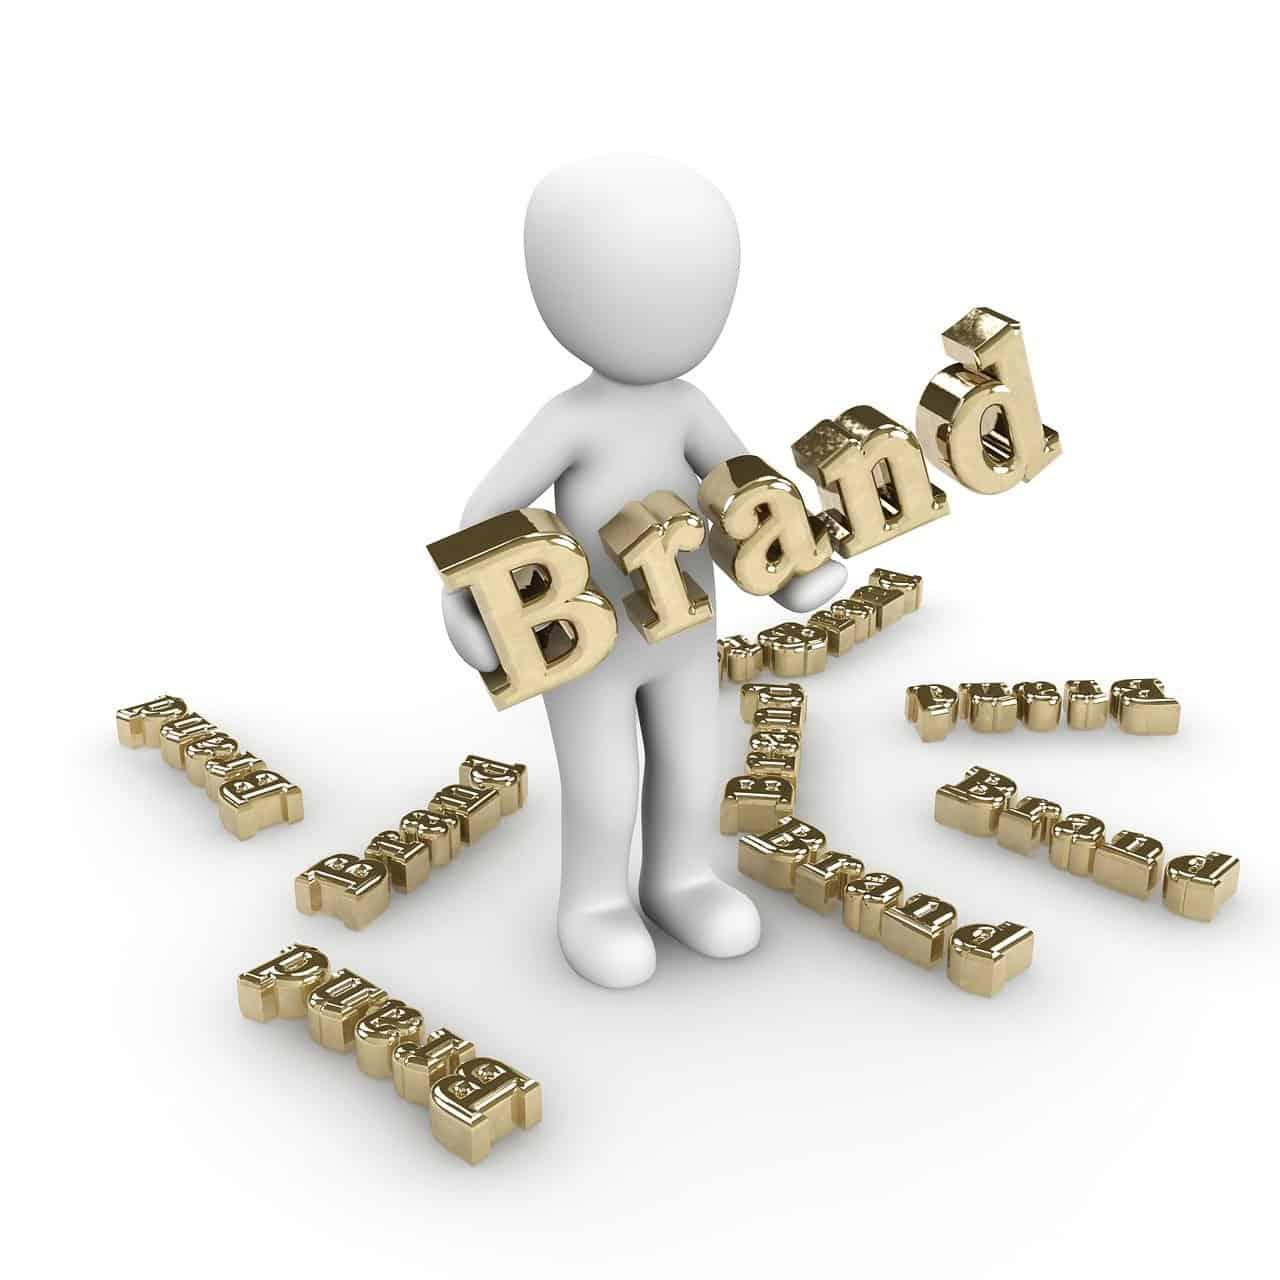 Make it brandable